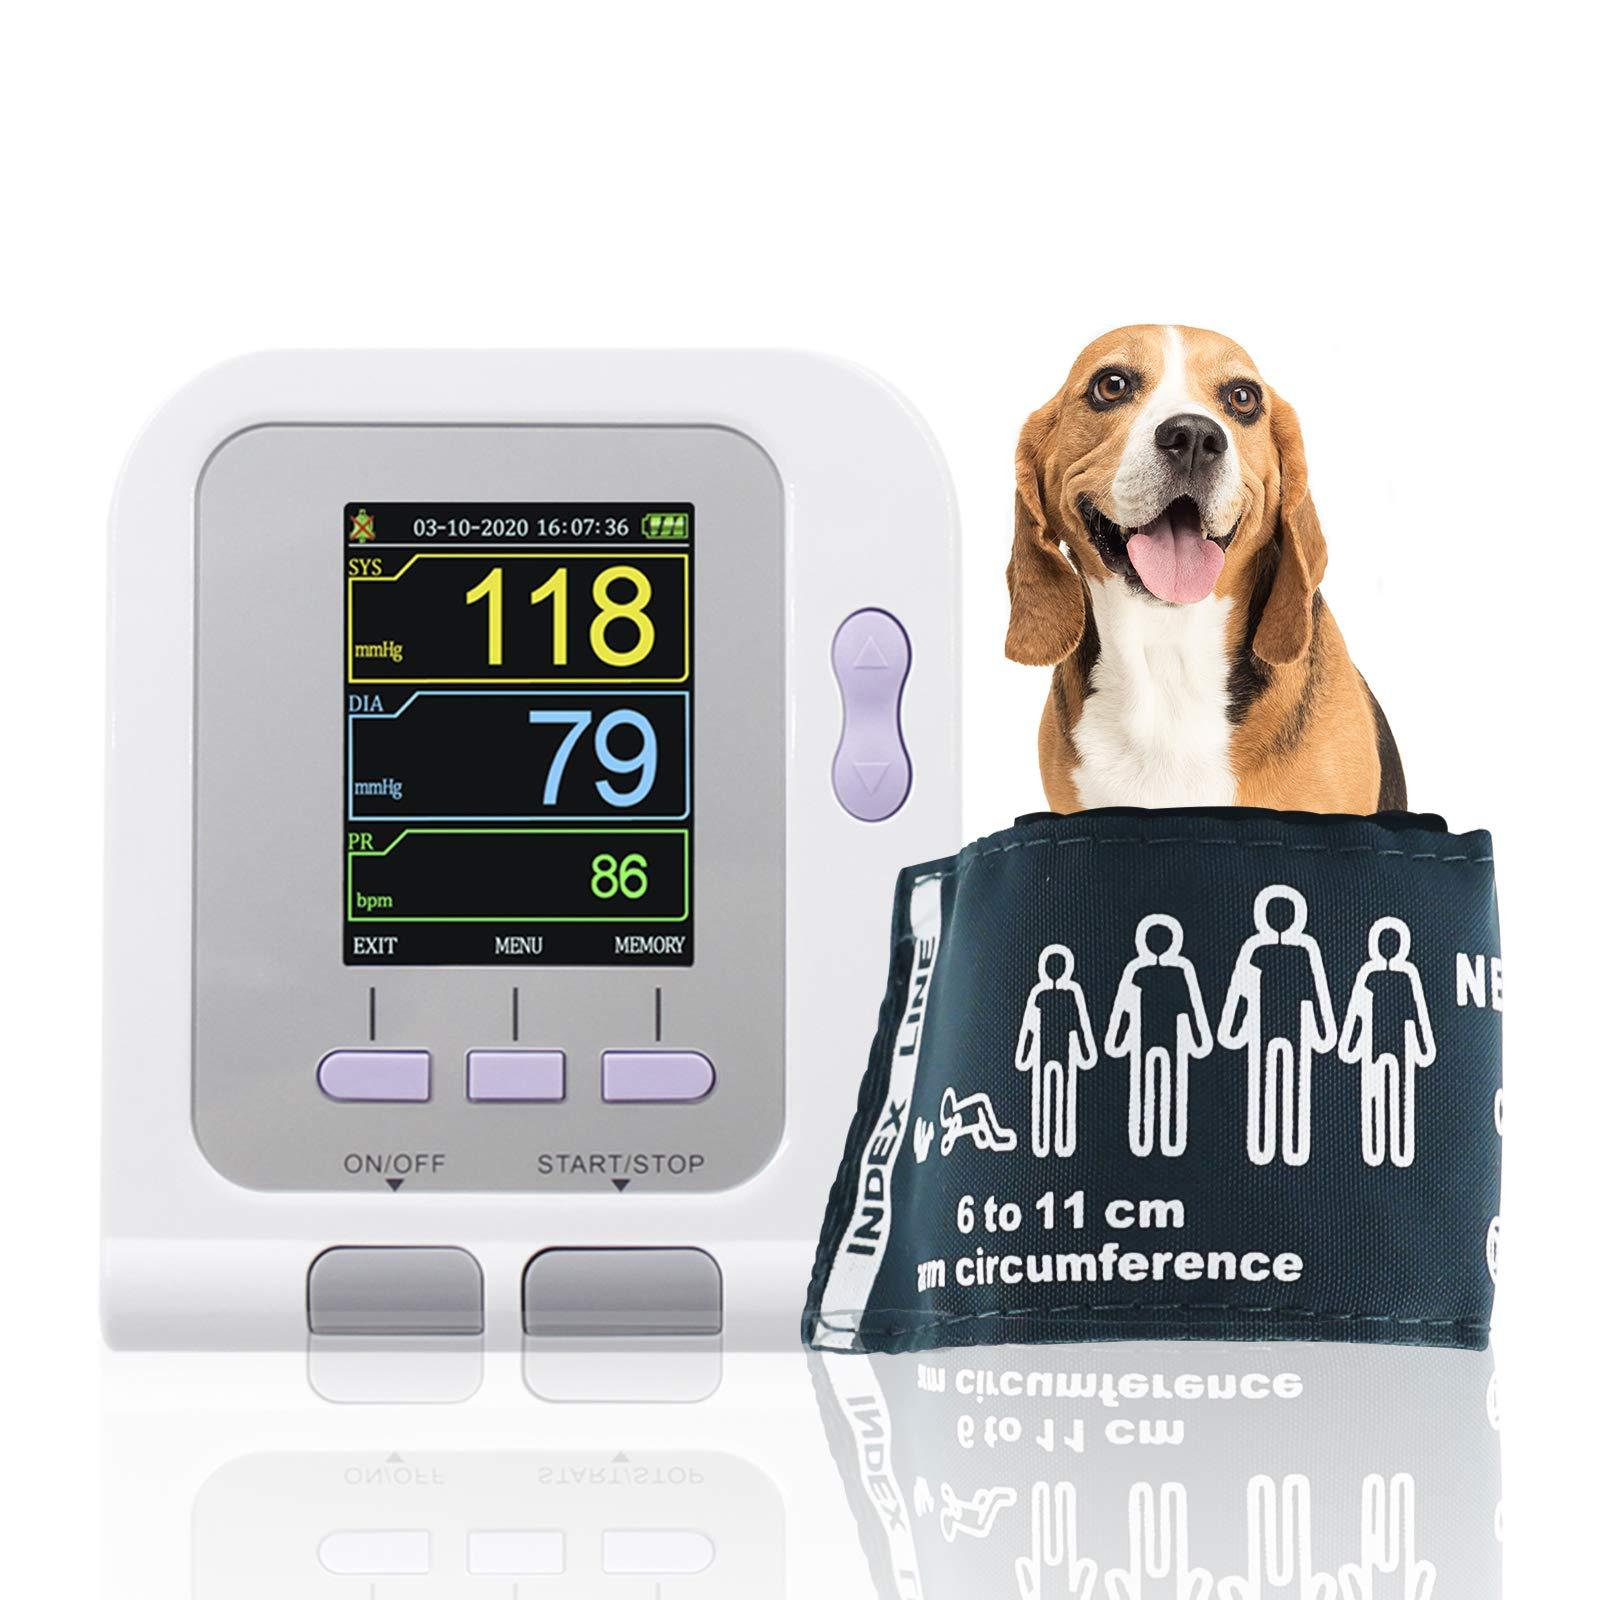 Vet Electronic Sphygmomanometer Automatic Blood Pressure Monitor Tonometer with PC Software CONTEC08A-VET